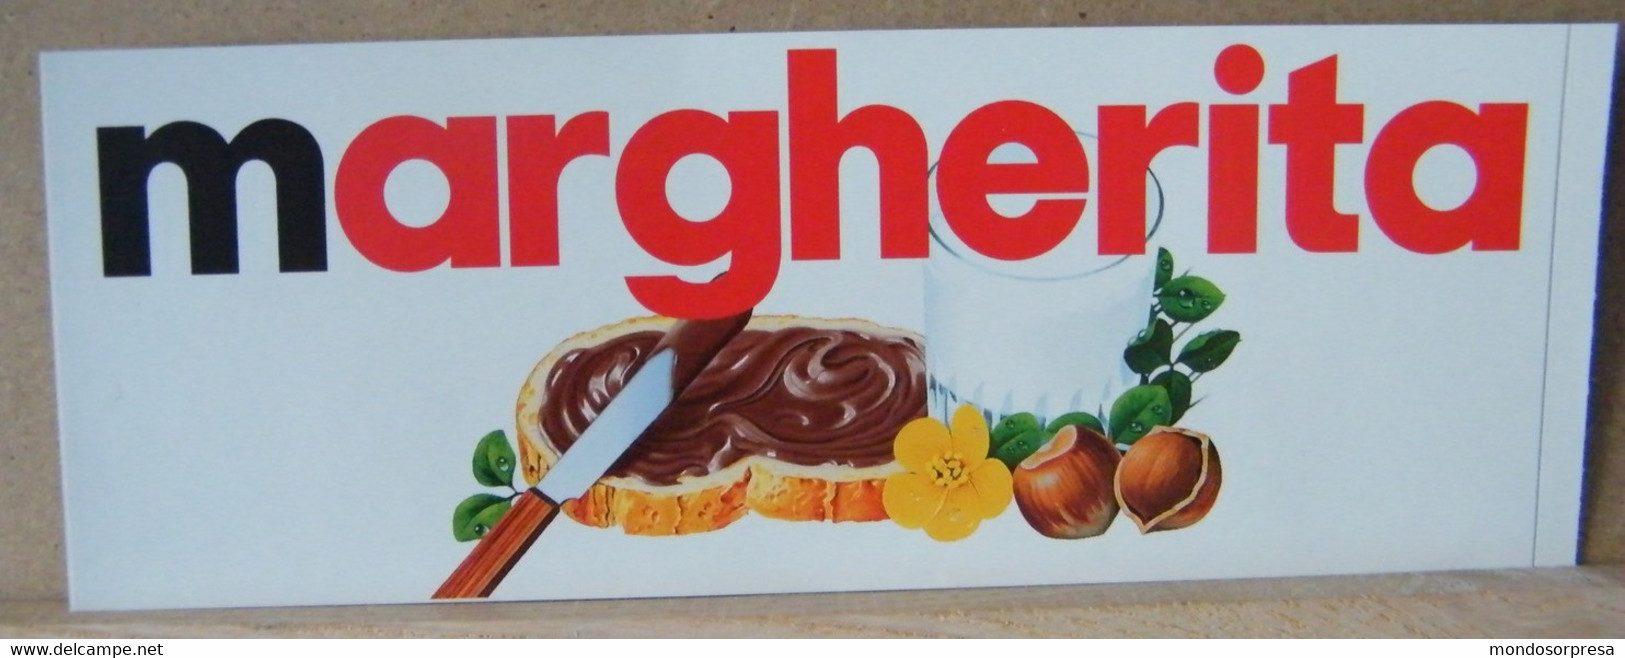 MONDOSORPRESA, ADESIVI NUTELLA NOMI, MARGHERITA - Nutella